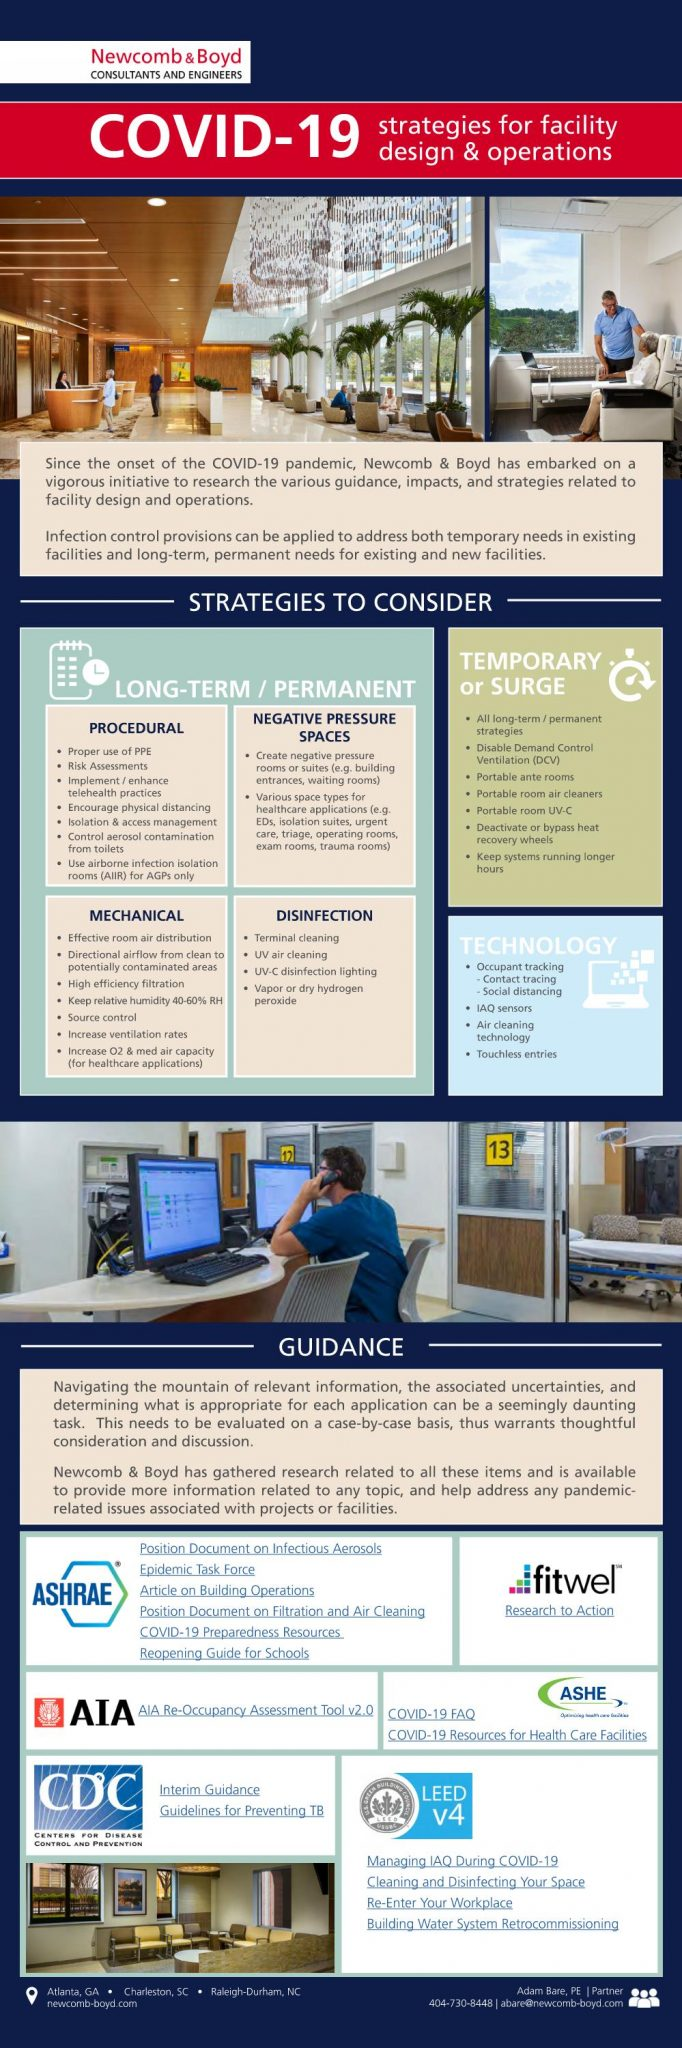 COVID-19_Strategies for Facility Design & Operations_Contact Adam Bare